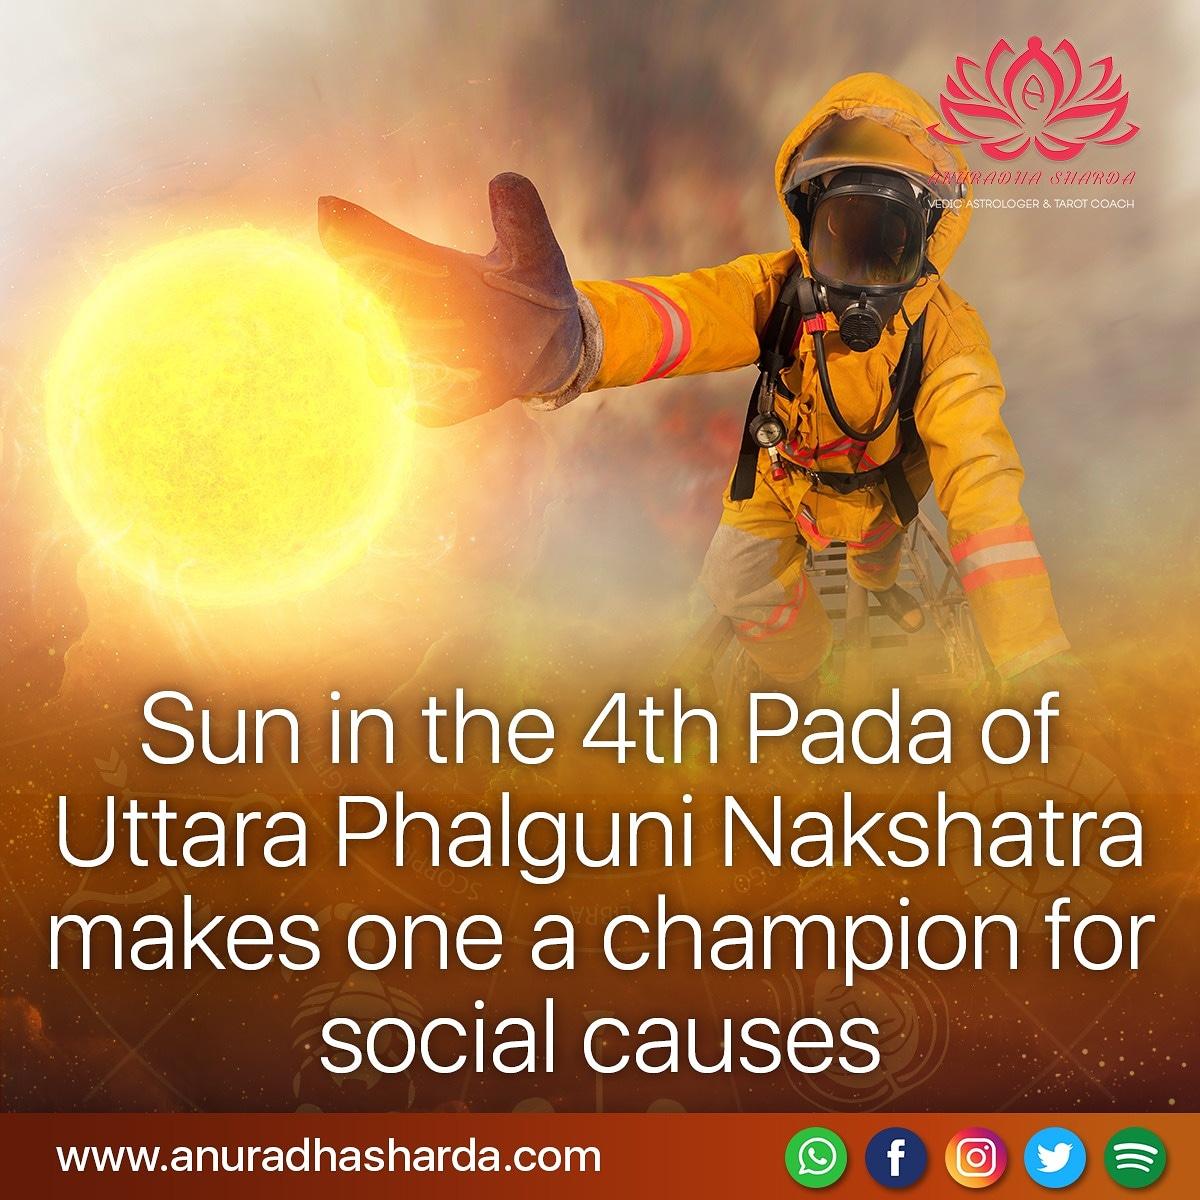 #astrologyposts #astrologydailyquotes #astrology #dailytransit #vedicastrology #Vedicastrologer #zodiacsigns #Sun #Moon #time #Nakshatra #UttaraPhalguni #Aryaman #upright #prosperous  Sun in 4th Pada of UttaraPhalguni Nakshatra makes you champion for social causes.